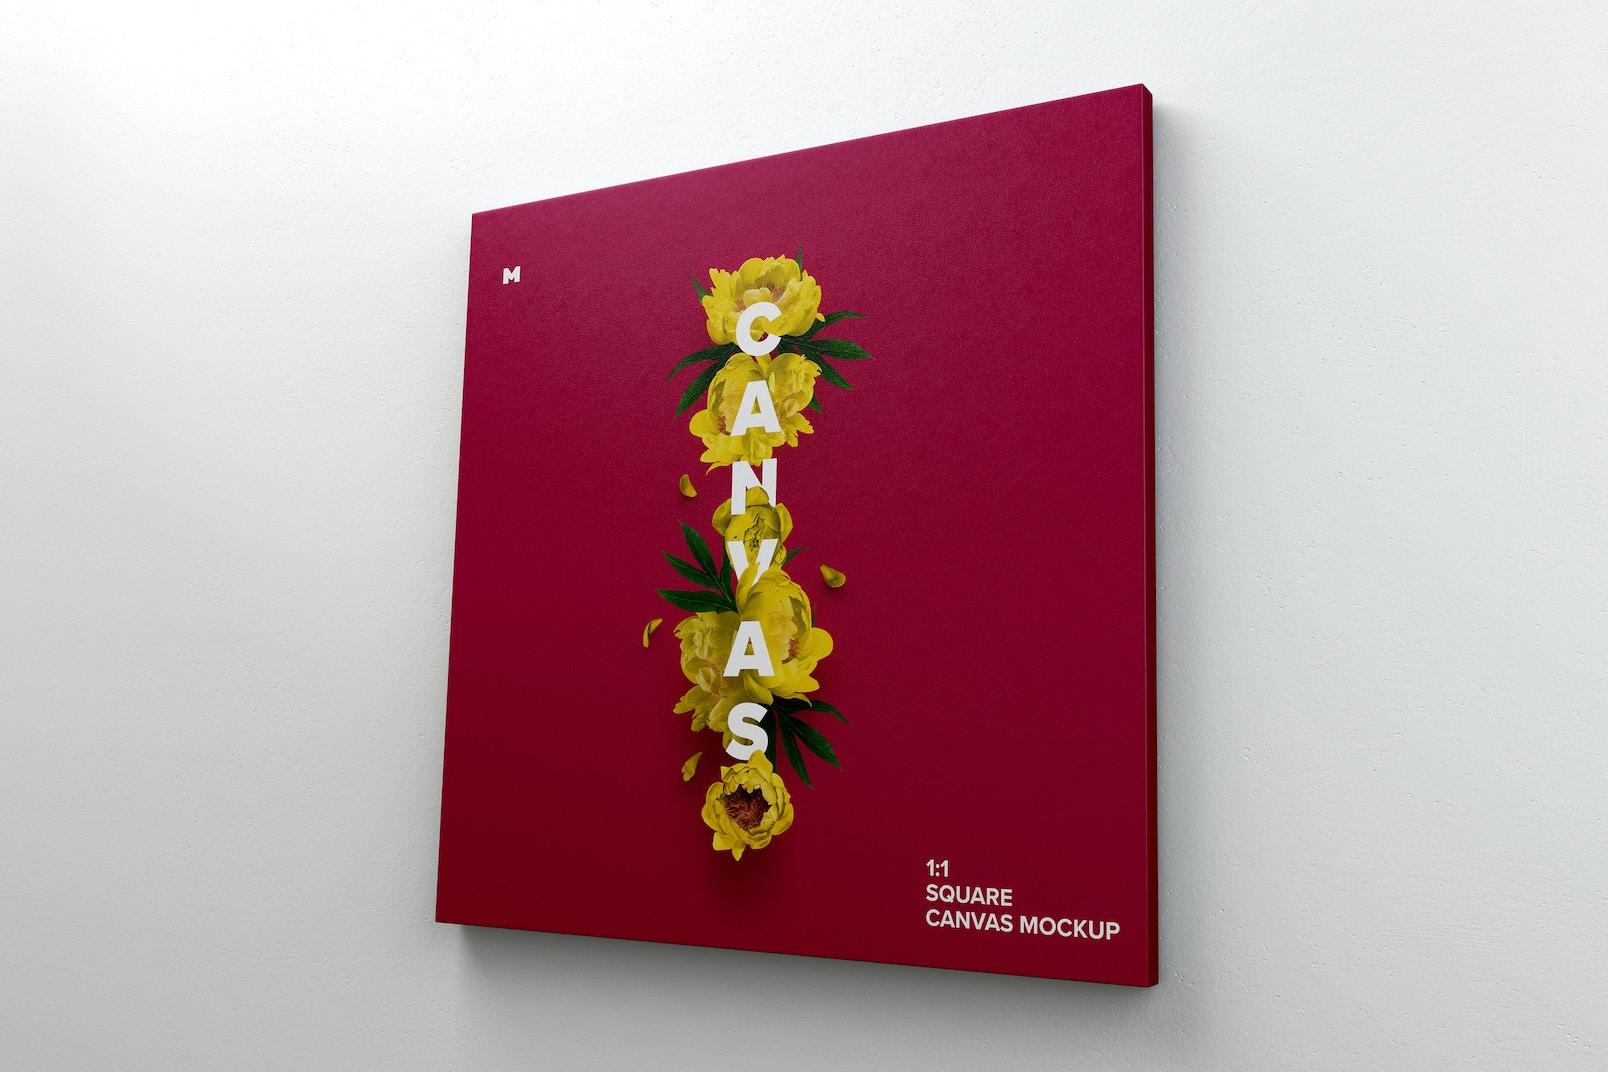 Vista perfecta de una Lona 1x1 colgada en la pared